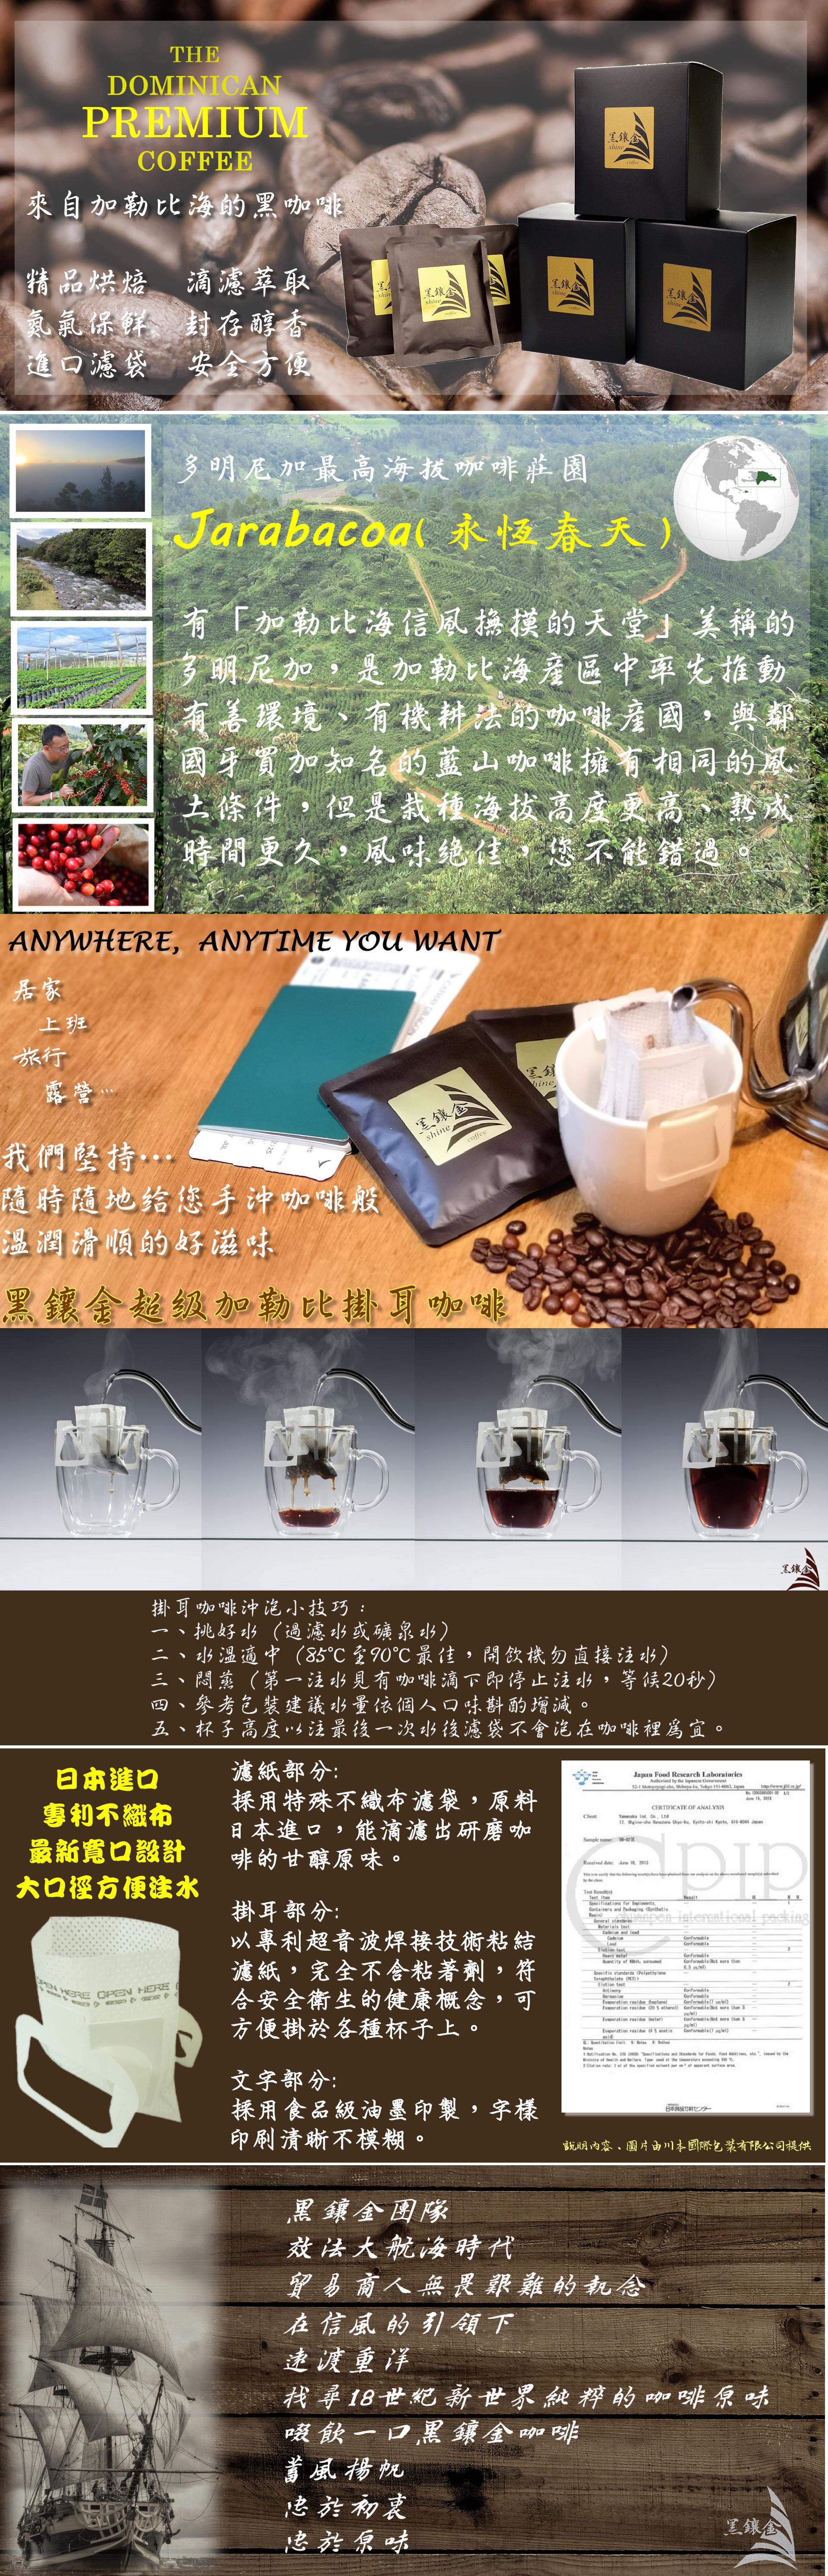 primcaribbeandripbagcoffee